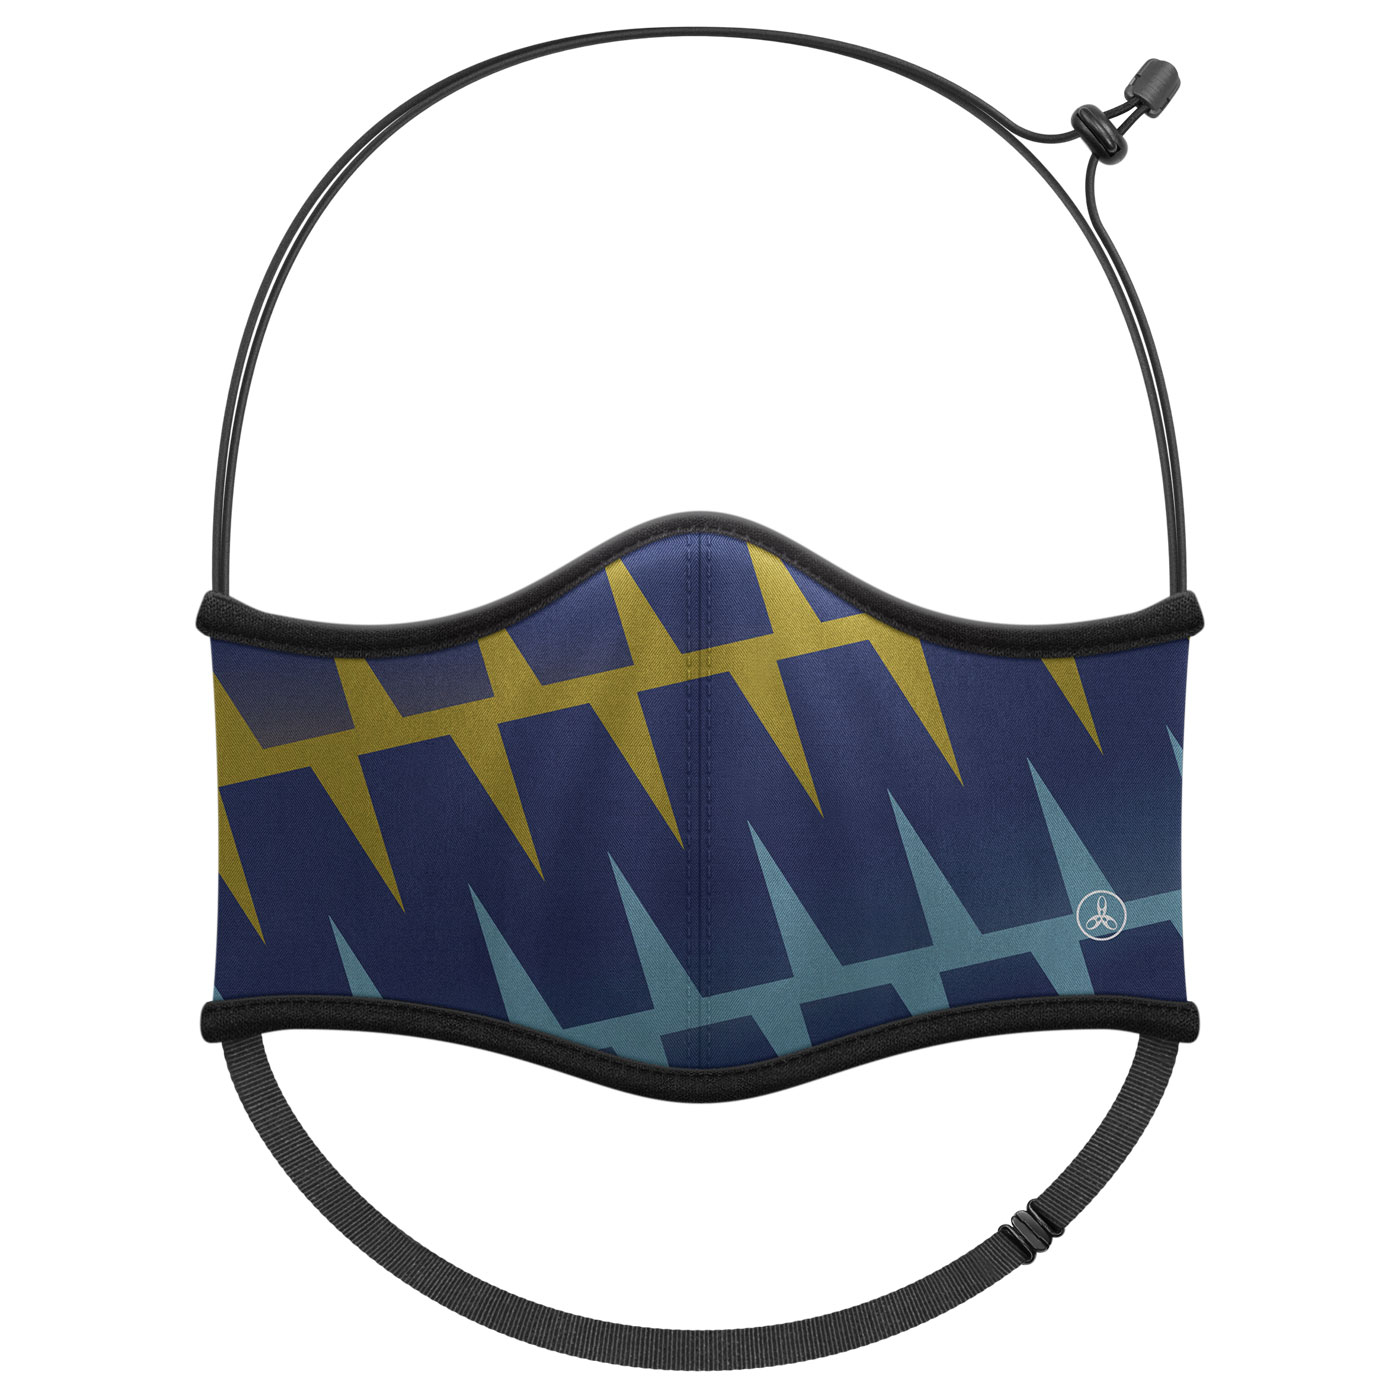 HODARLA 運動舒適口罩6032201 - 丈青黃藍